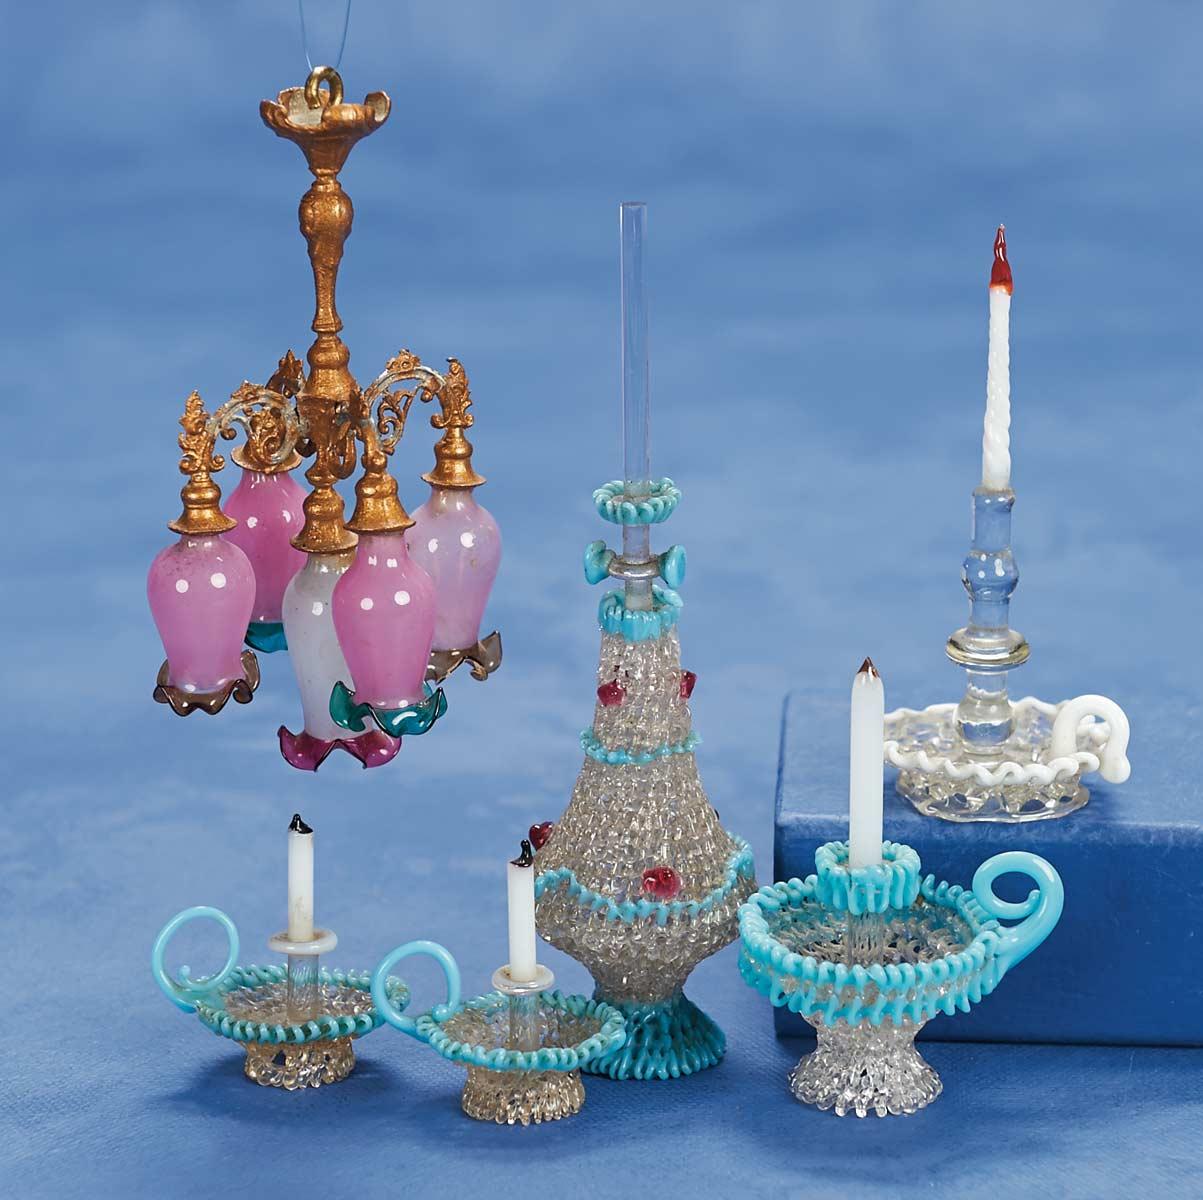 2 Volume Set: 168 19th Century Miniature Dollhouse